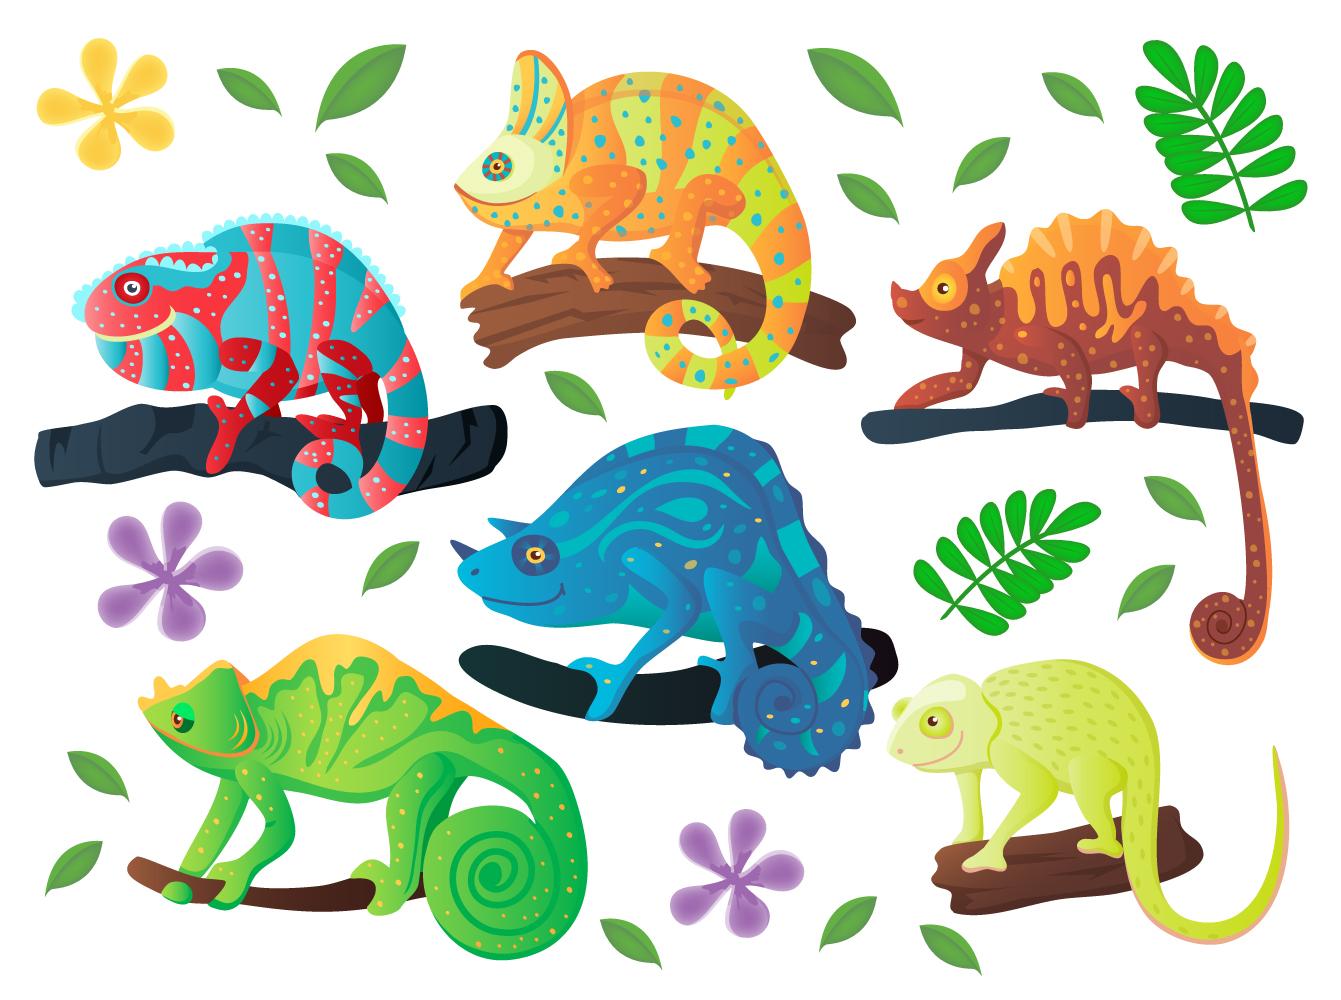 Chameleon iguana cartoon vector set example image 2